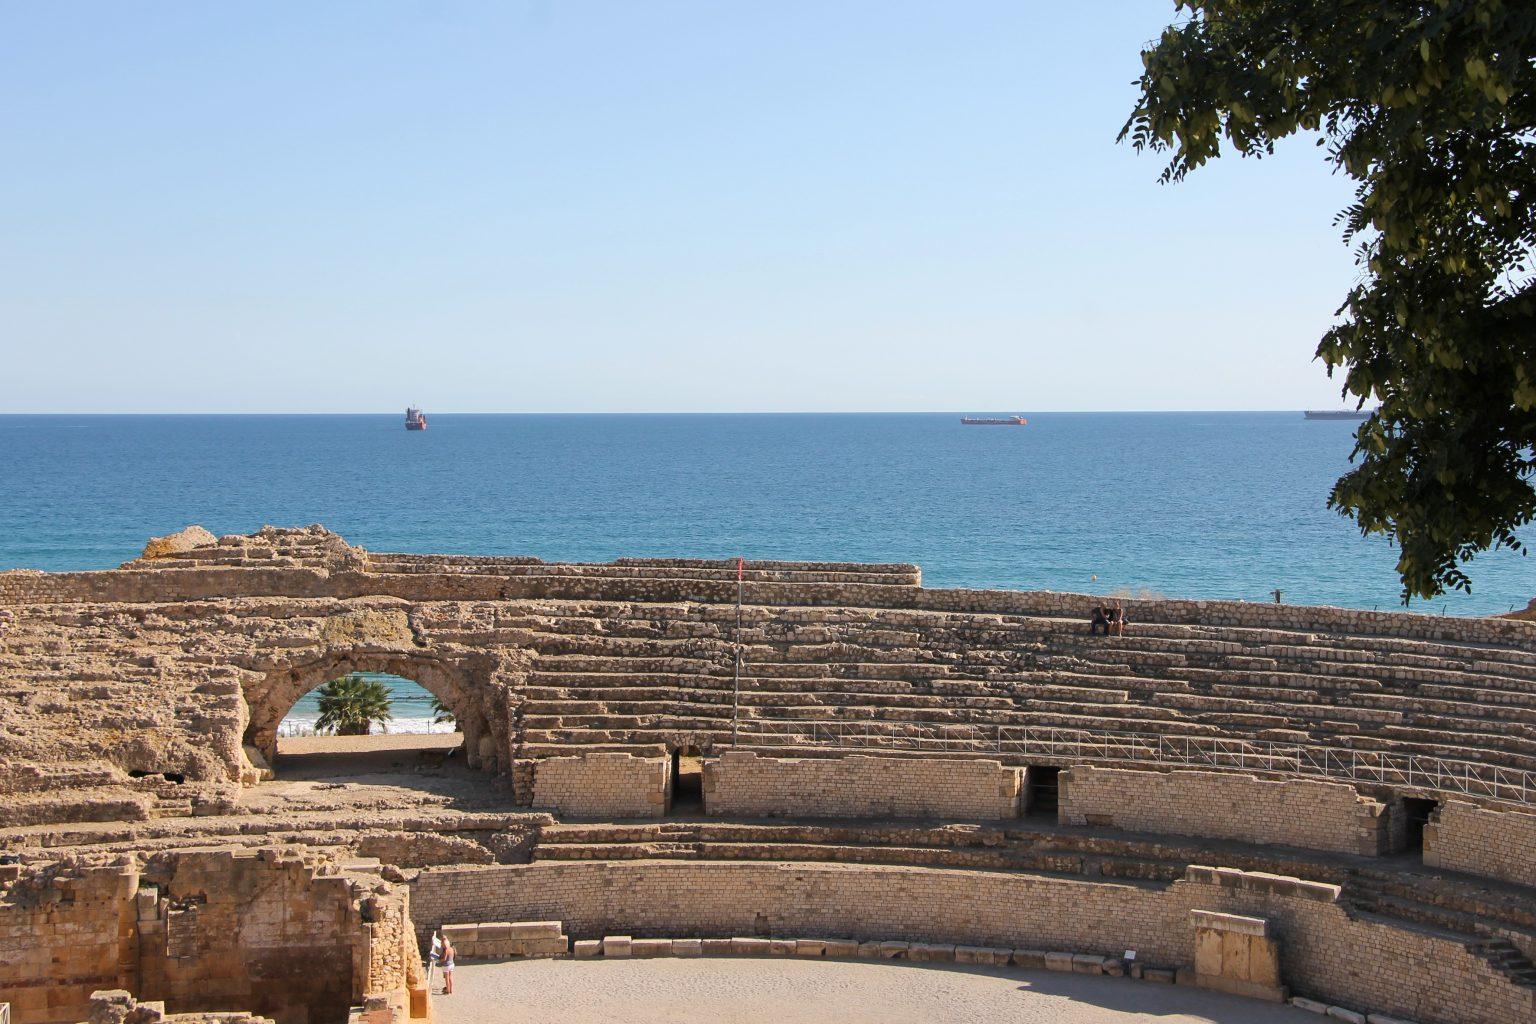 Tarragona Must see